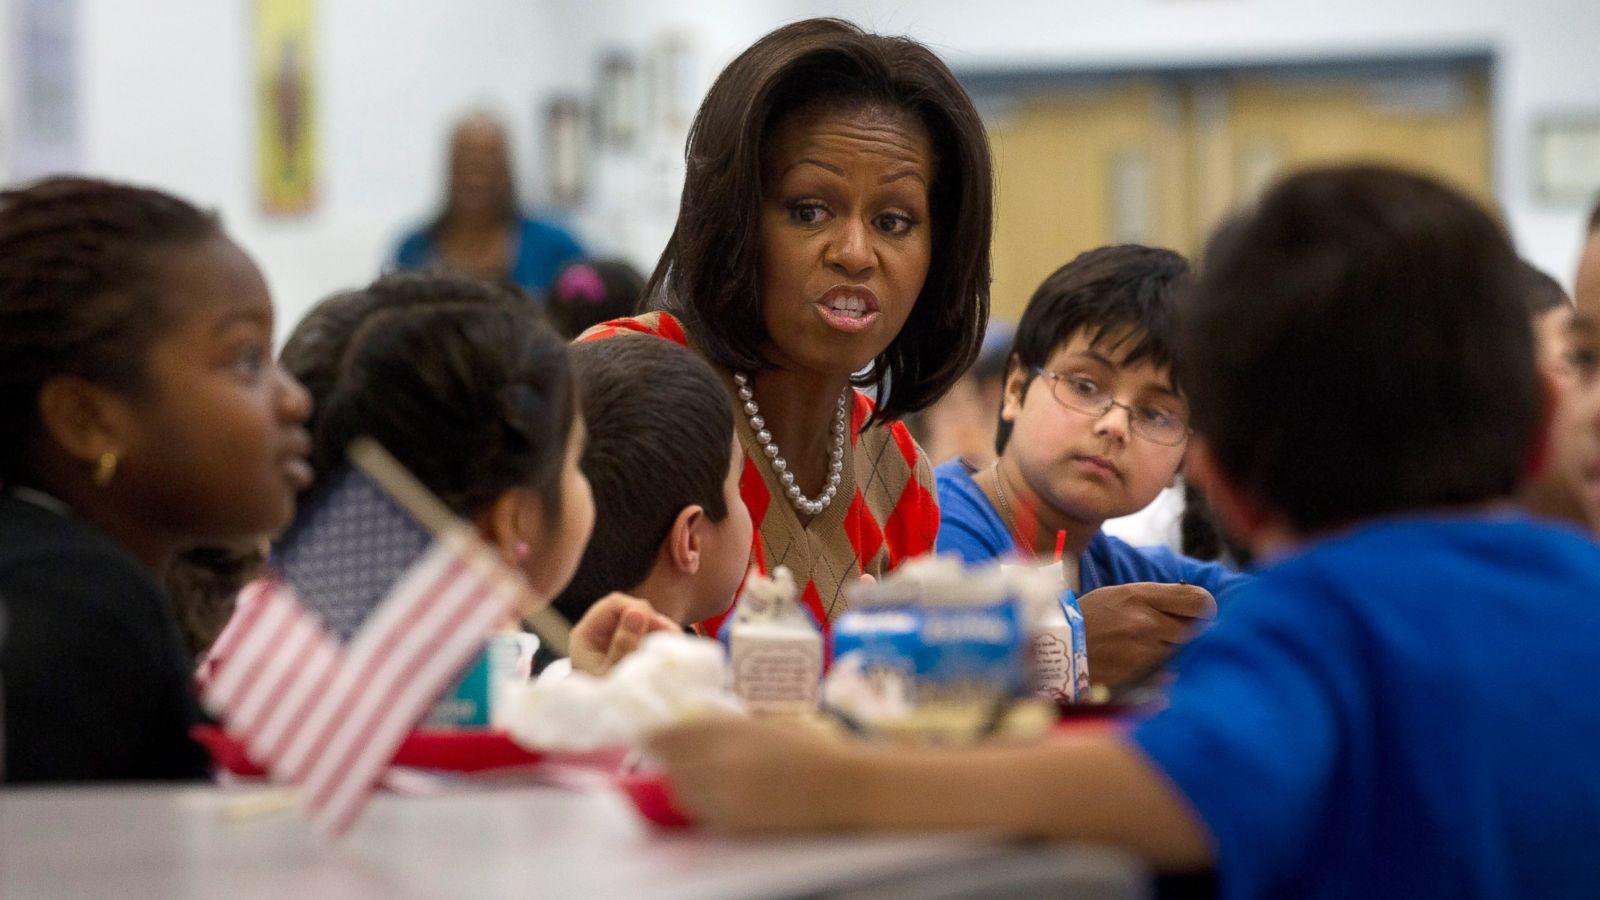 michelle obama gop congress head toward truce on school